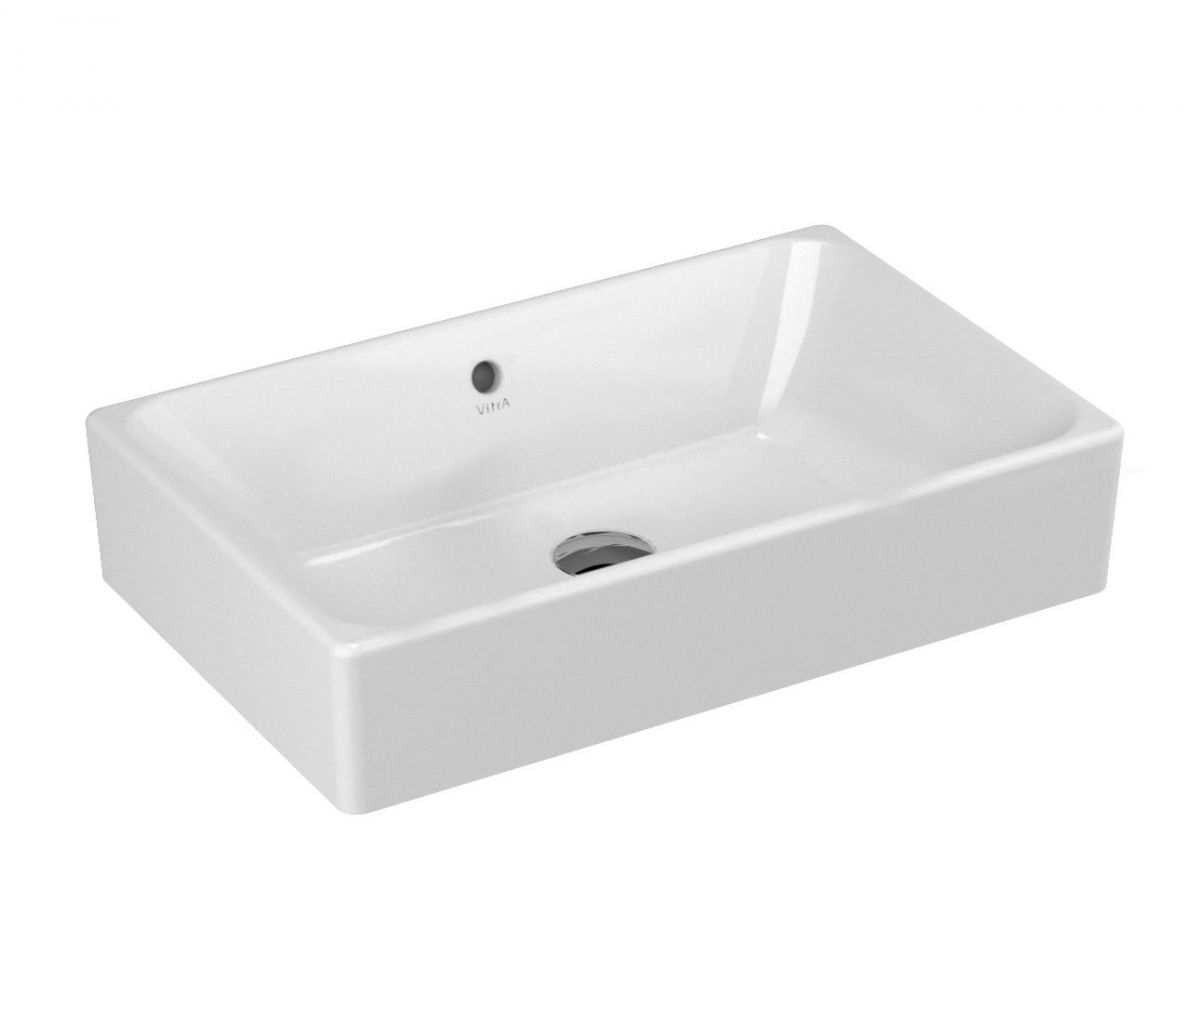 Bathroom Basin Countertop : ... basin vitrad160 4434 home bathrooms basins and sinks countertop basins